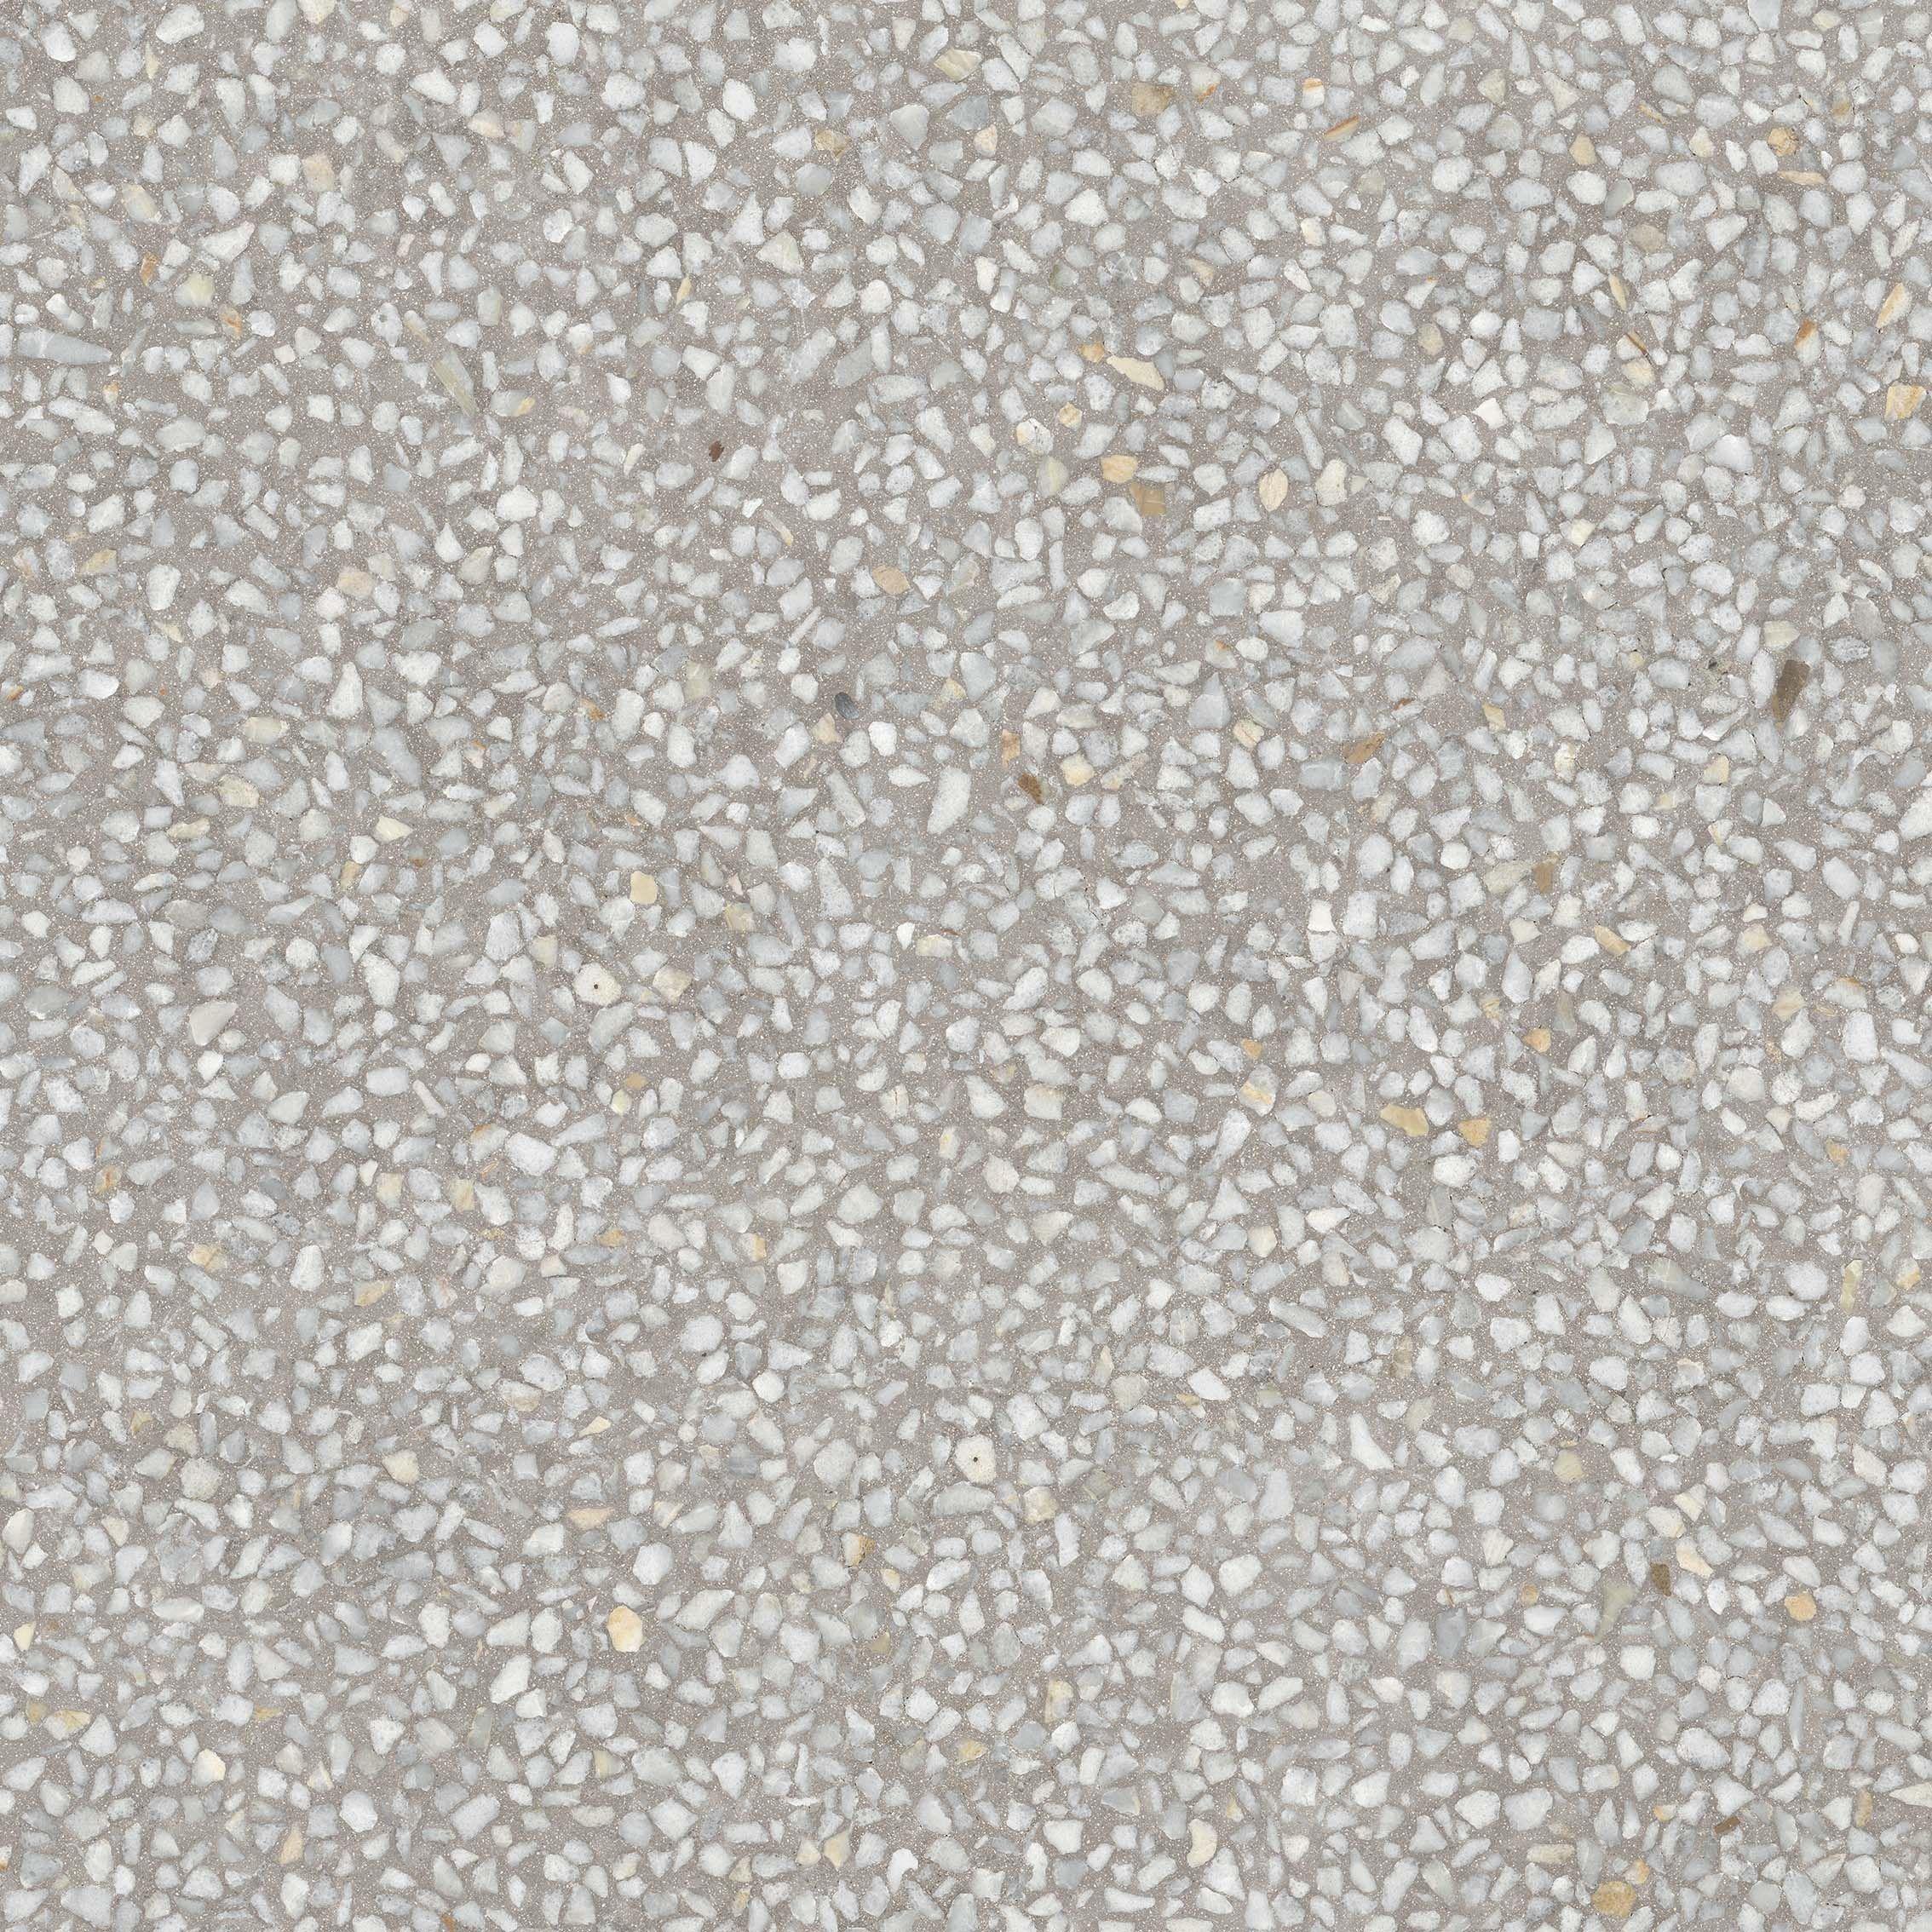 Portofino r cemento 80x80 cm vives ceramica pavimento for Baldosas de terrazo